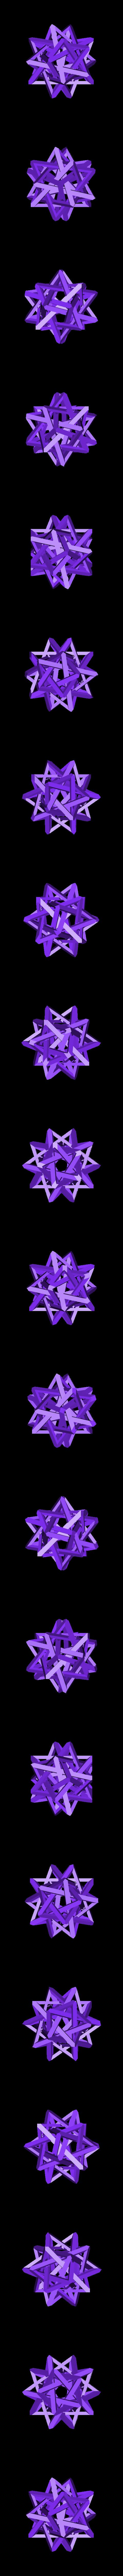 5T-white.stl Download free STL file Interlocking Tetrahedra • 3D printing object, Roger